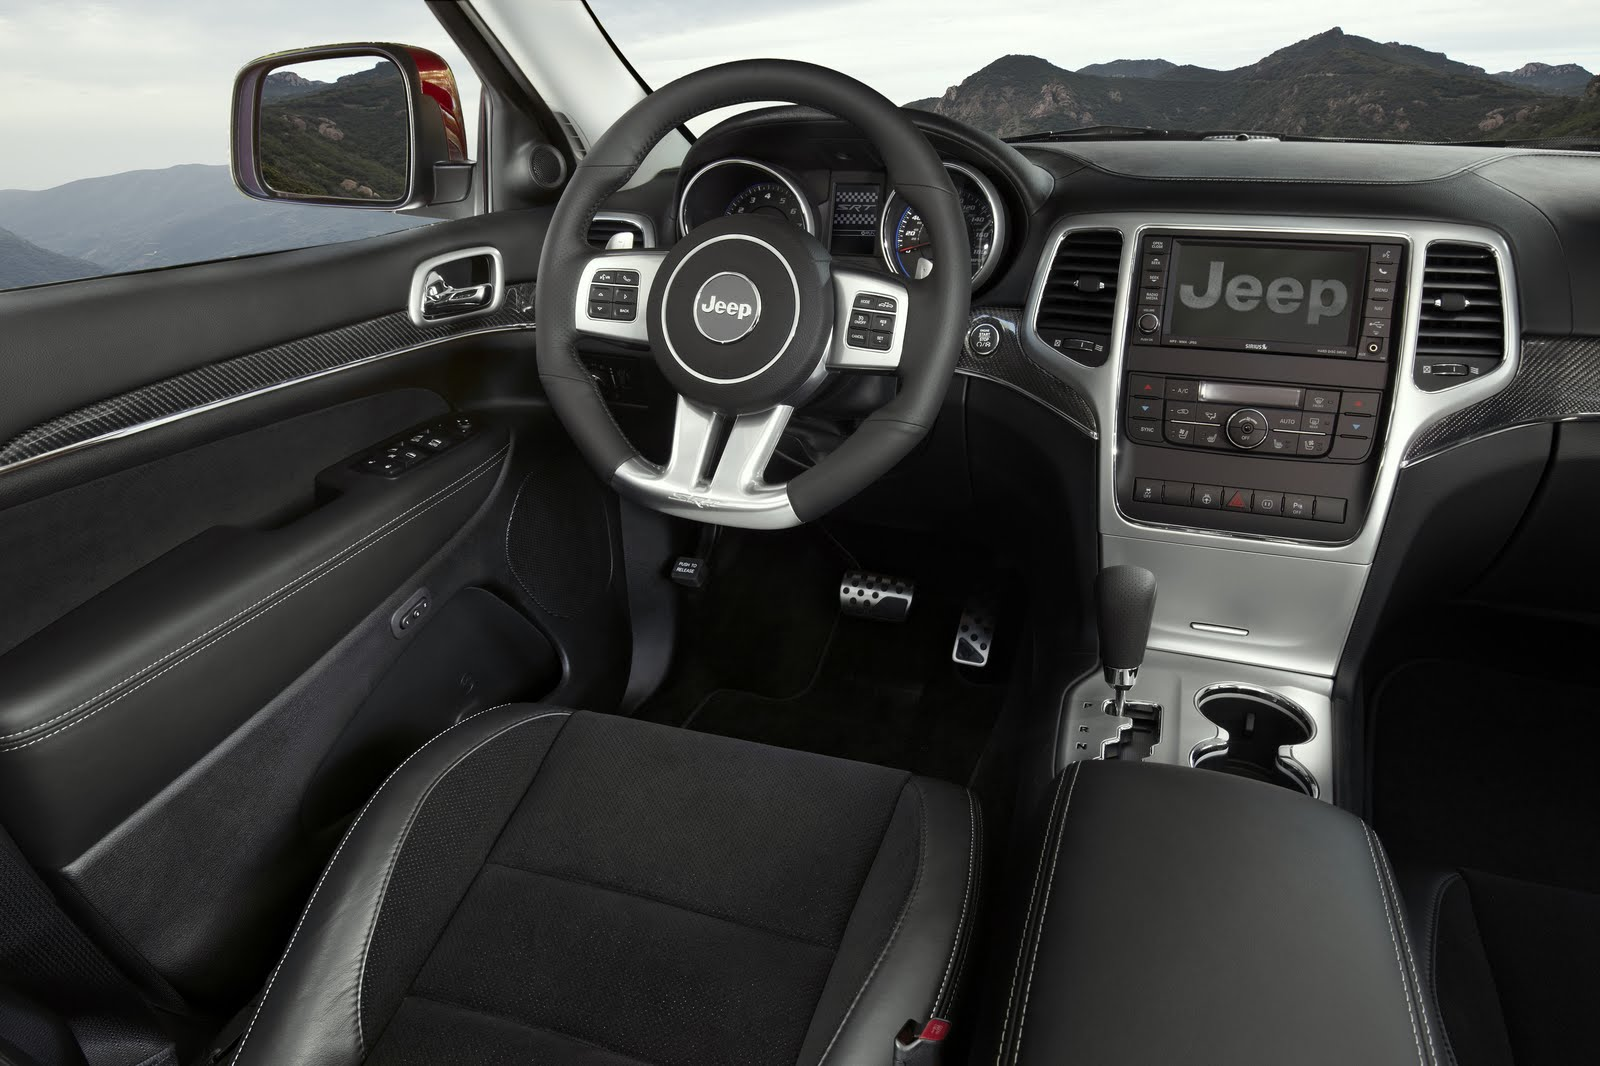 jeep-srt8-dash.jpg